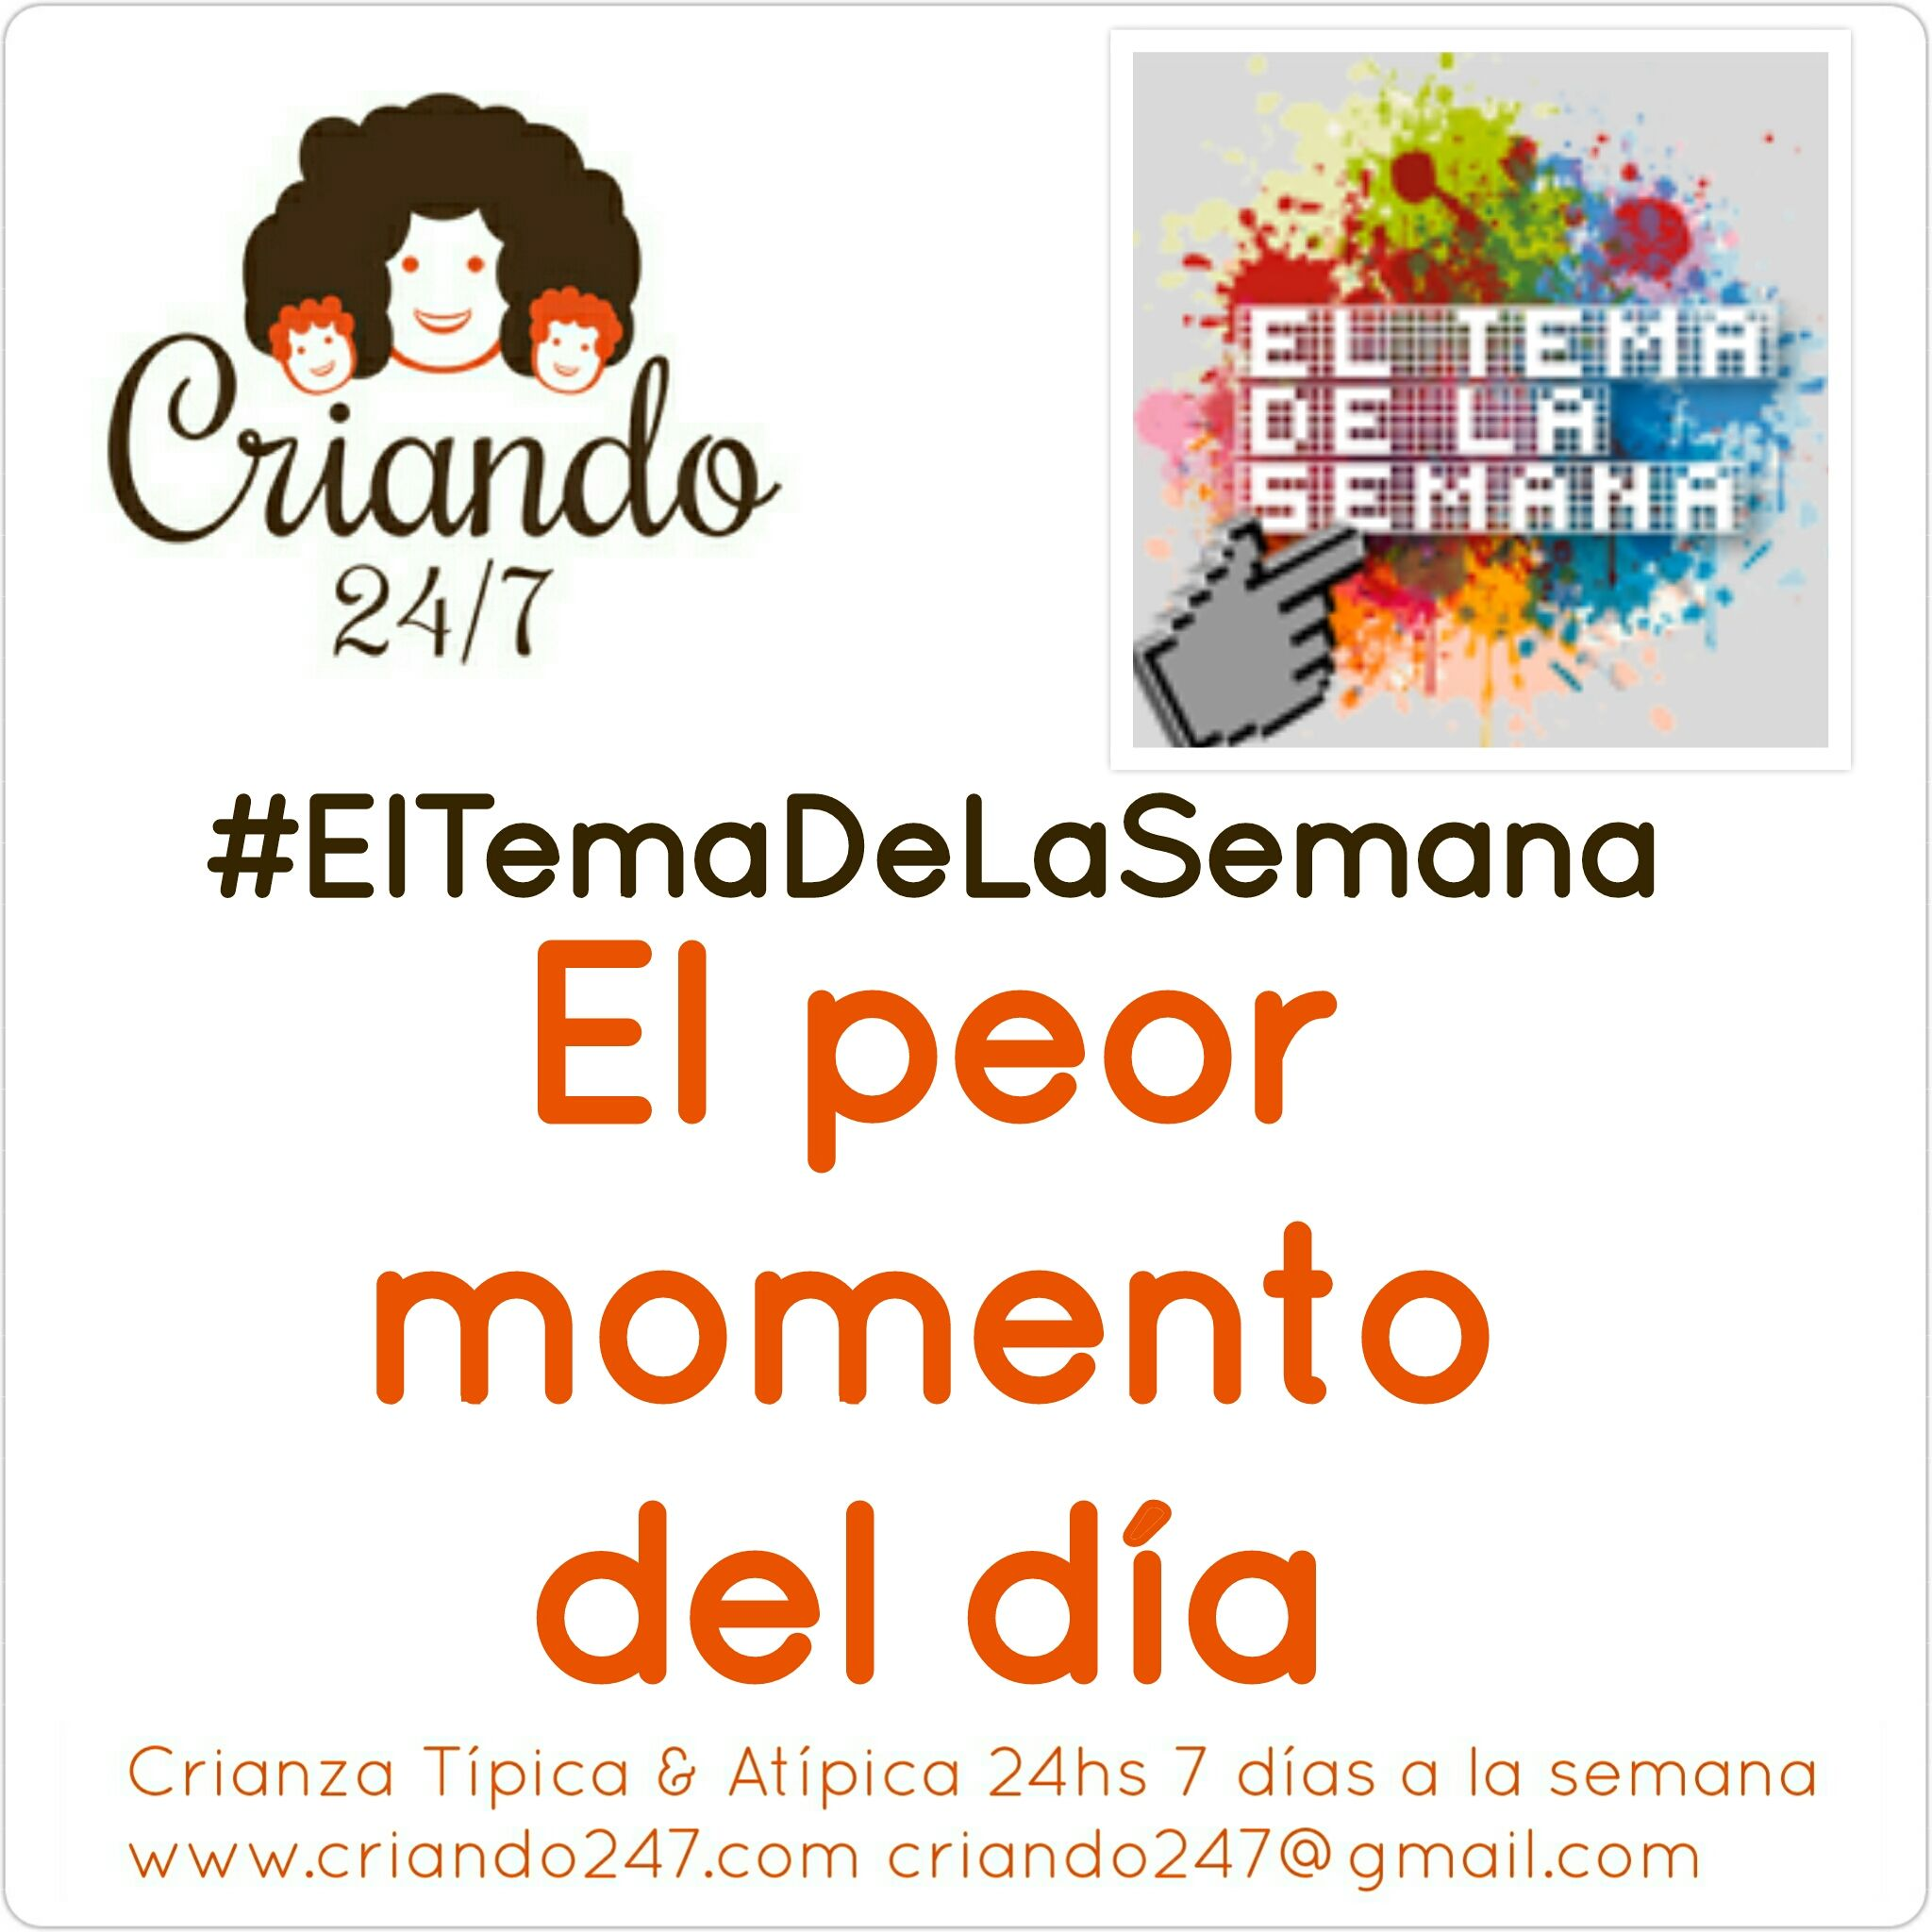 Criando247 #ElTemaDeLaSemana #ElPeorMomentoDelDía